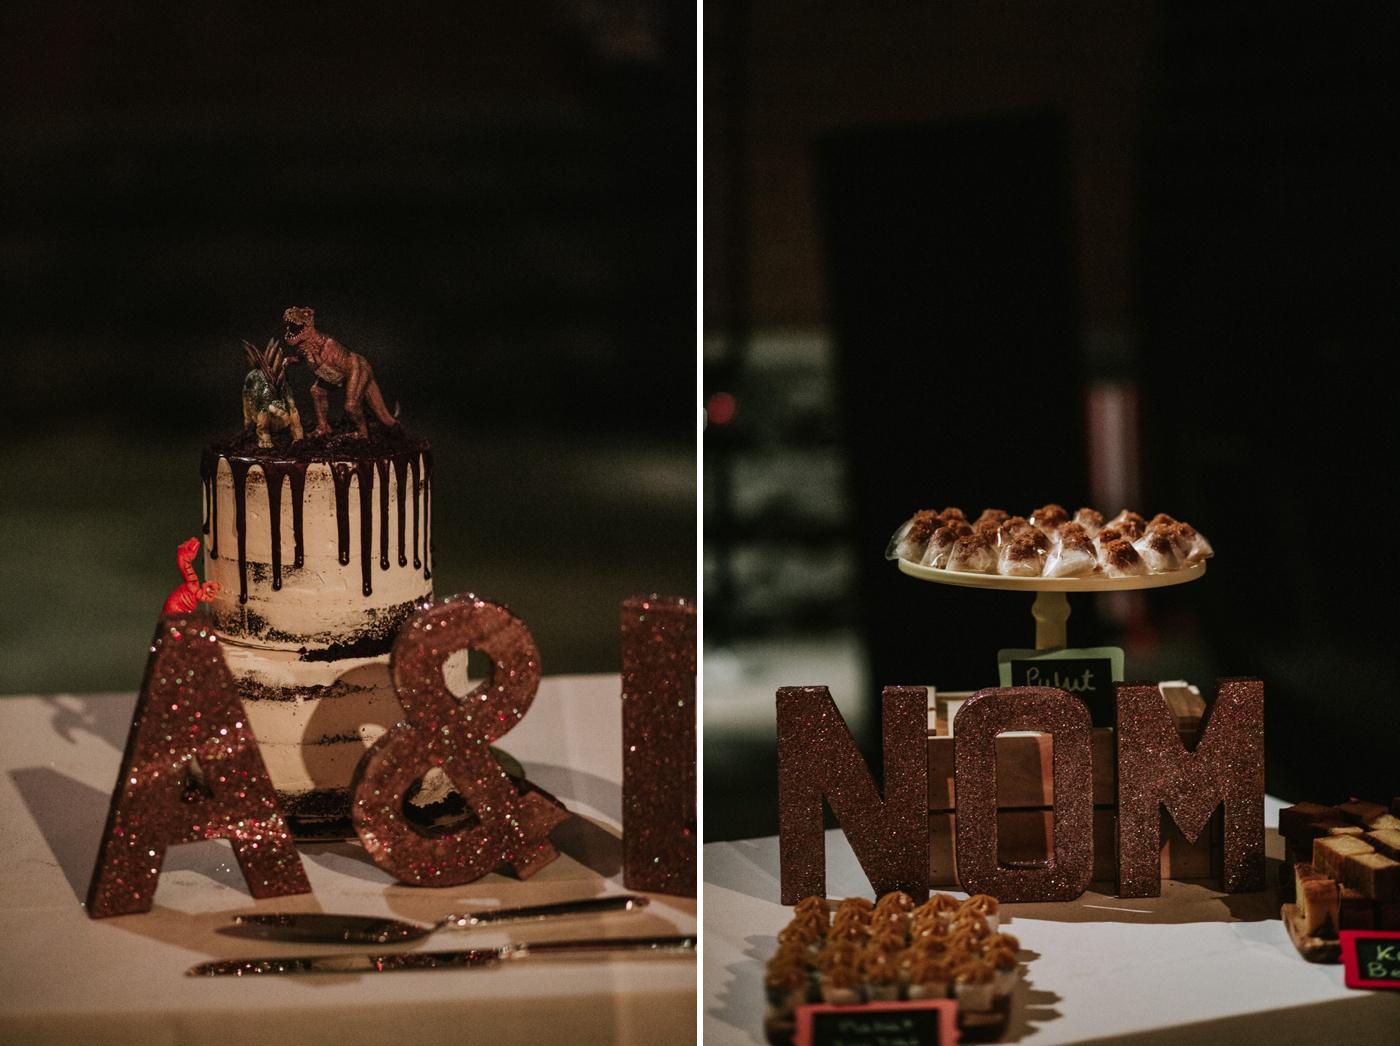 anitadaniel_melbourne-scienceworks-relaxed-fun-geek-wedding_melbourne-candid-wedding-photography_74